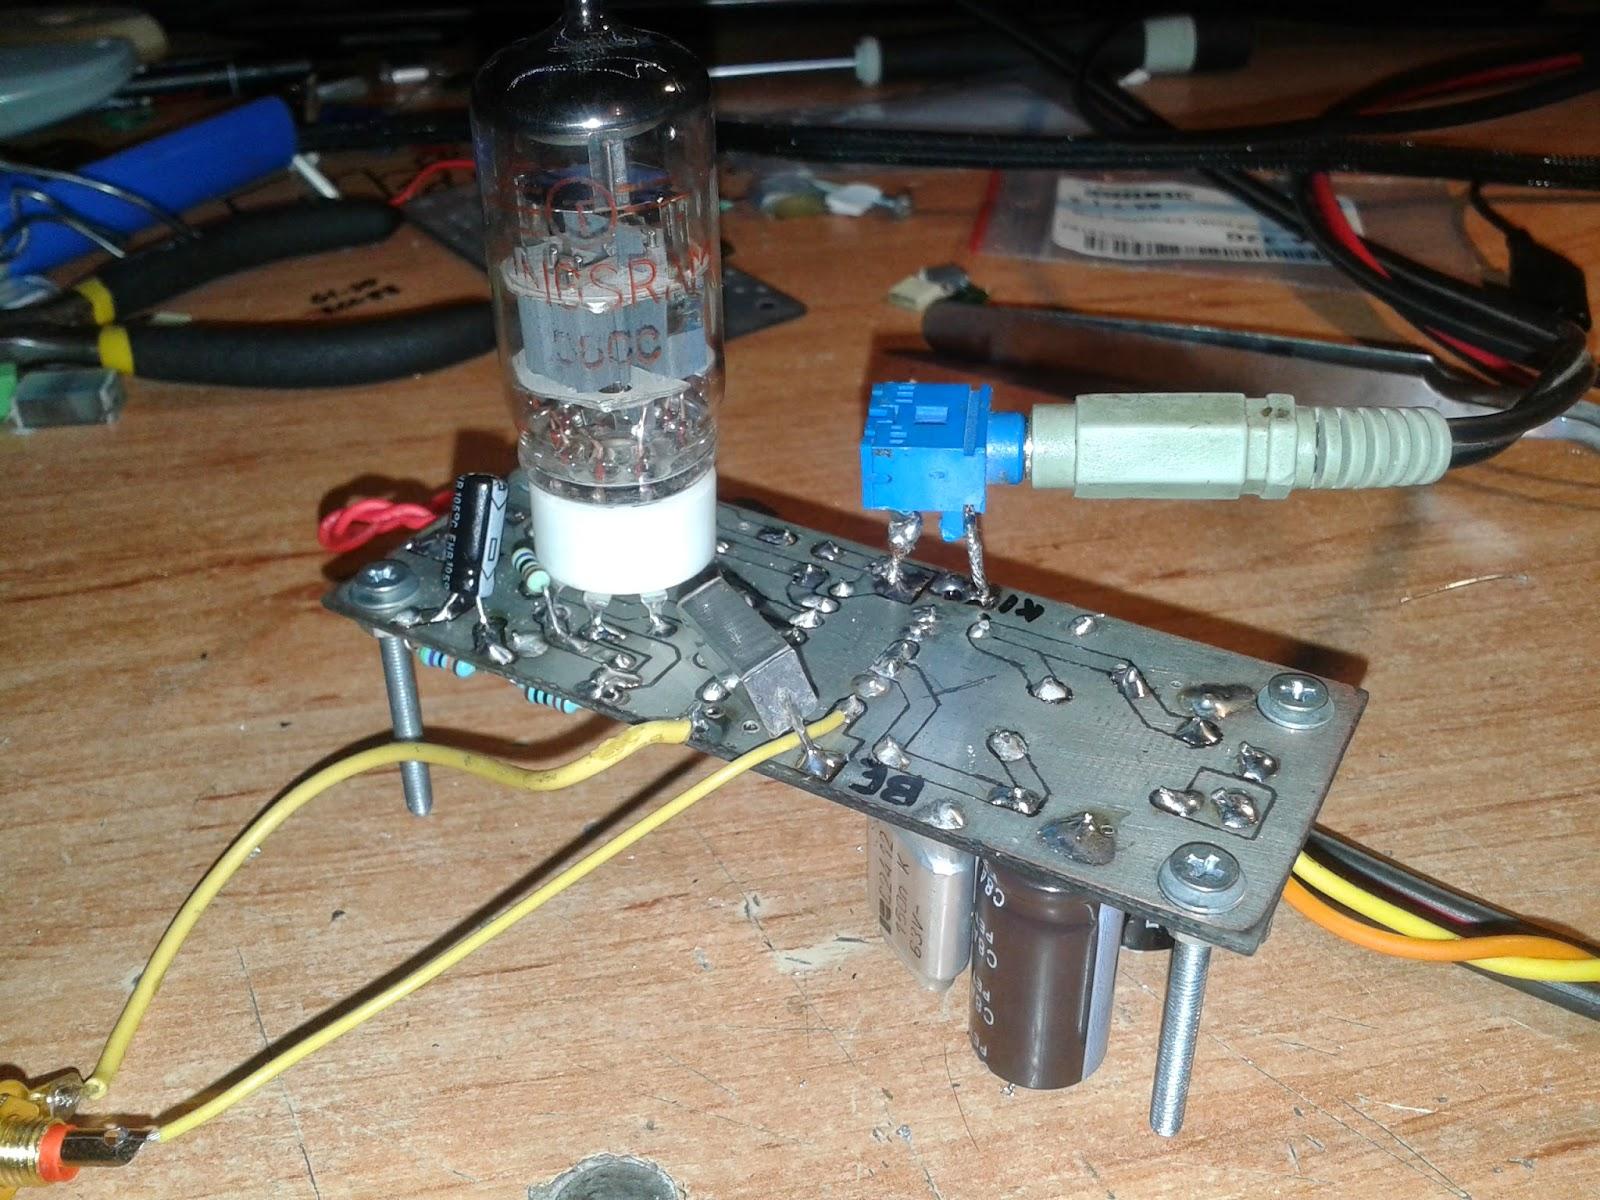 Diy Csves El Fokozat Ecc88 82 Vel Elektrobarlang The Fu29 Pushpull Circuit Amplifiercircuit Diagram Gi 30 As Csvel Ptett Otl Fejhallgat Erstm Fokozatt Mutatom Be At Hasznltam Hozz De A Kapcsols Ecc82 Is Tkletesen Mkdik